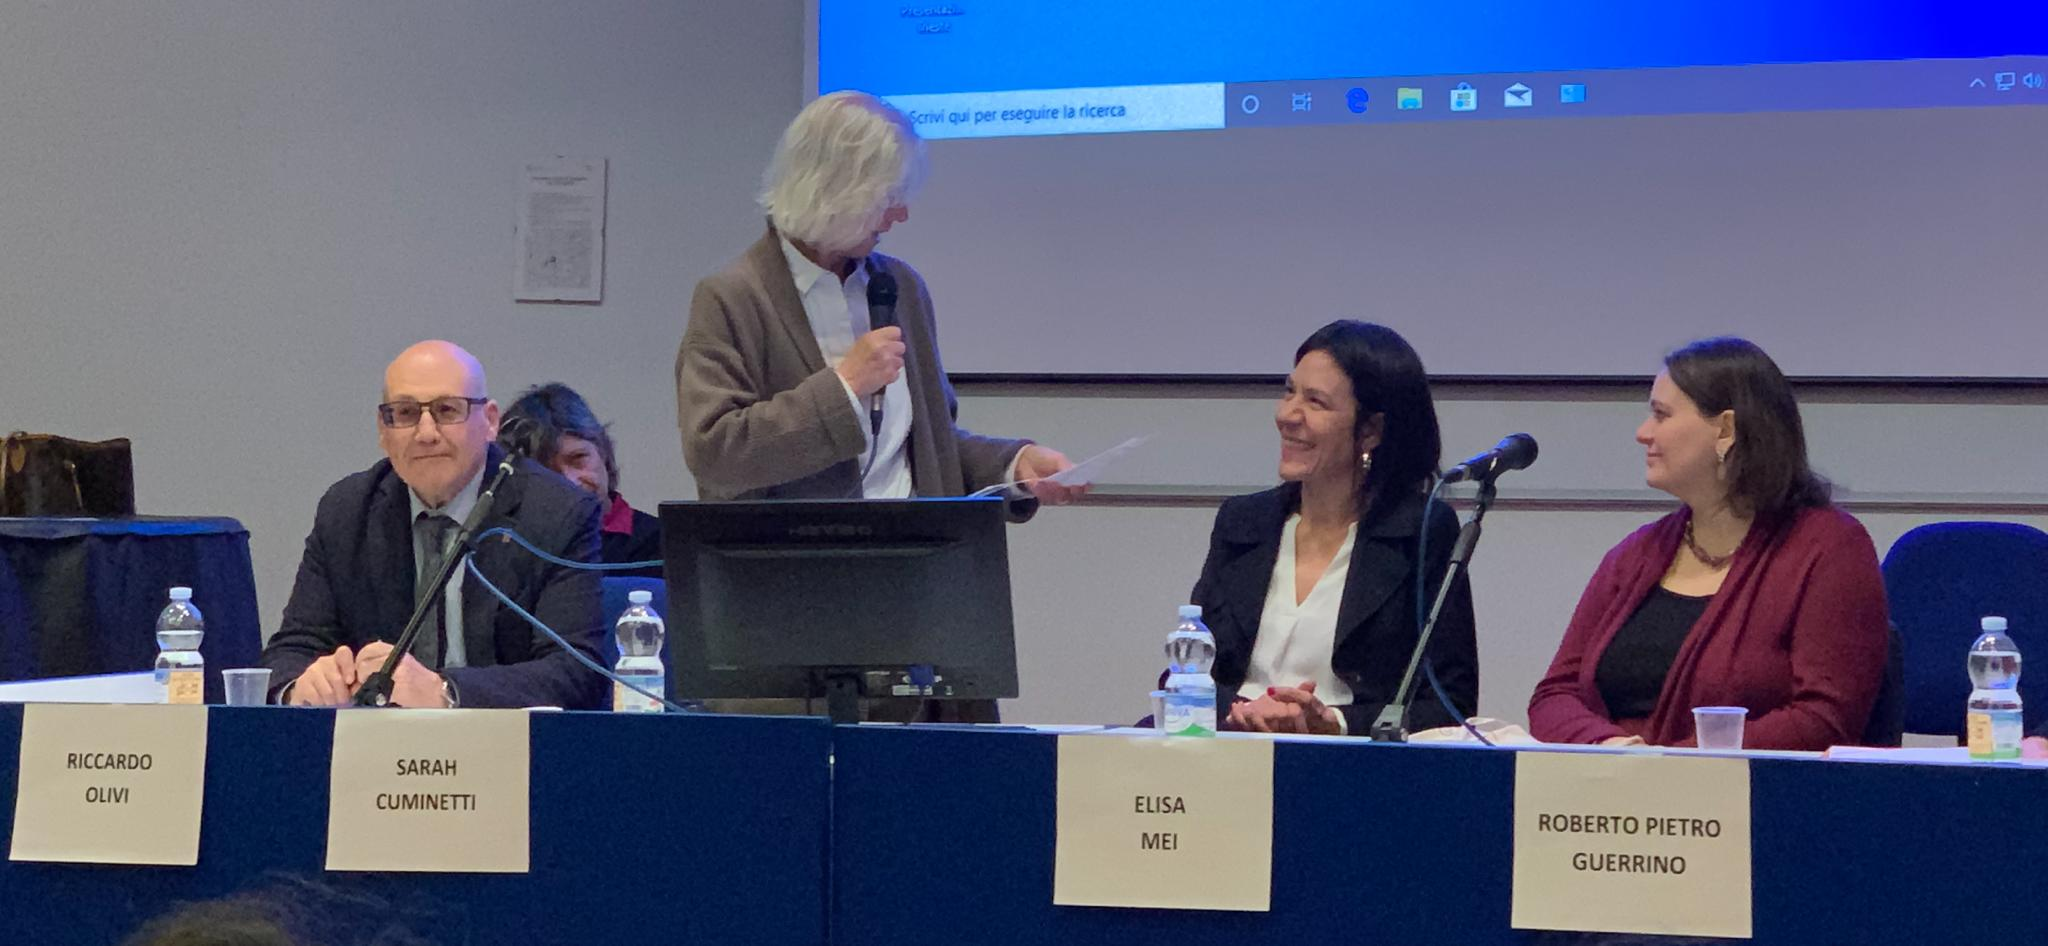 SSLMIT Trieste Italy 2019